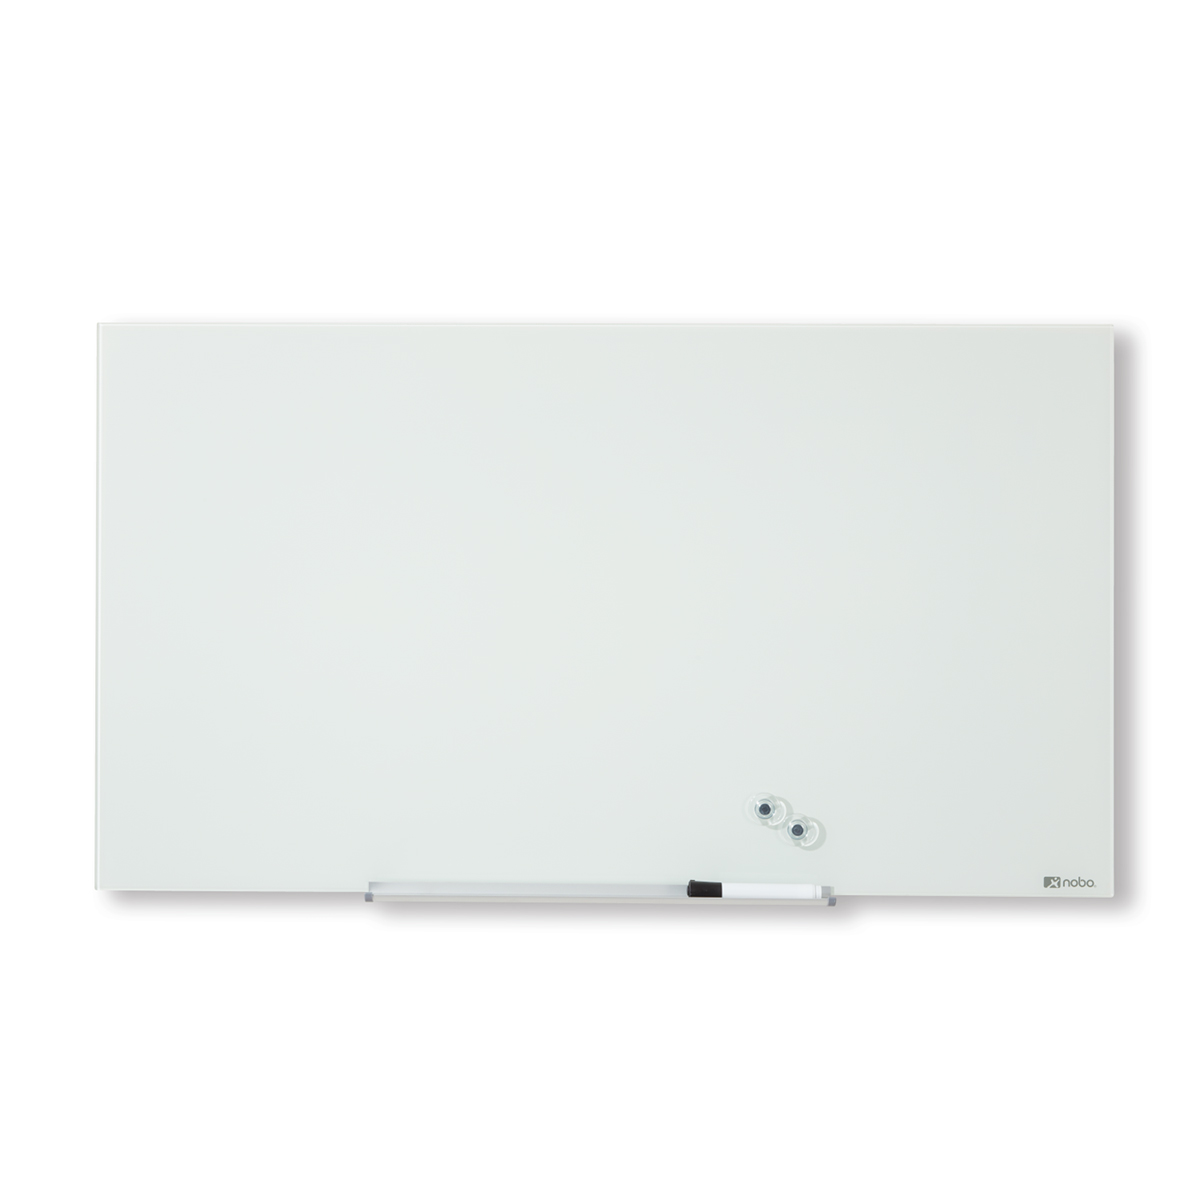 Nobo 1905175 Diamond Glass Whiteboard 667 x 381mm